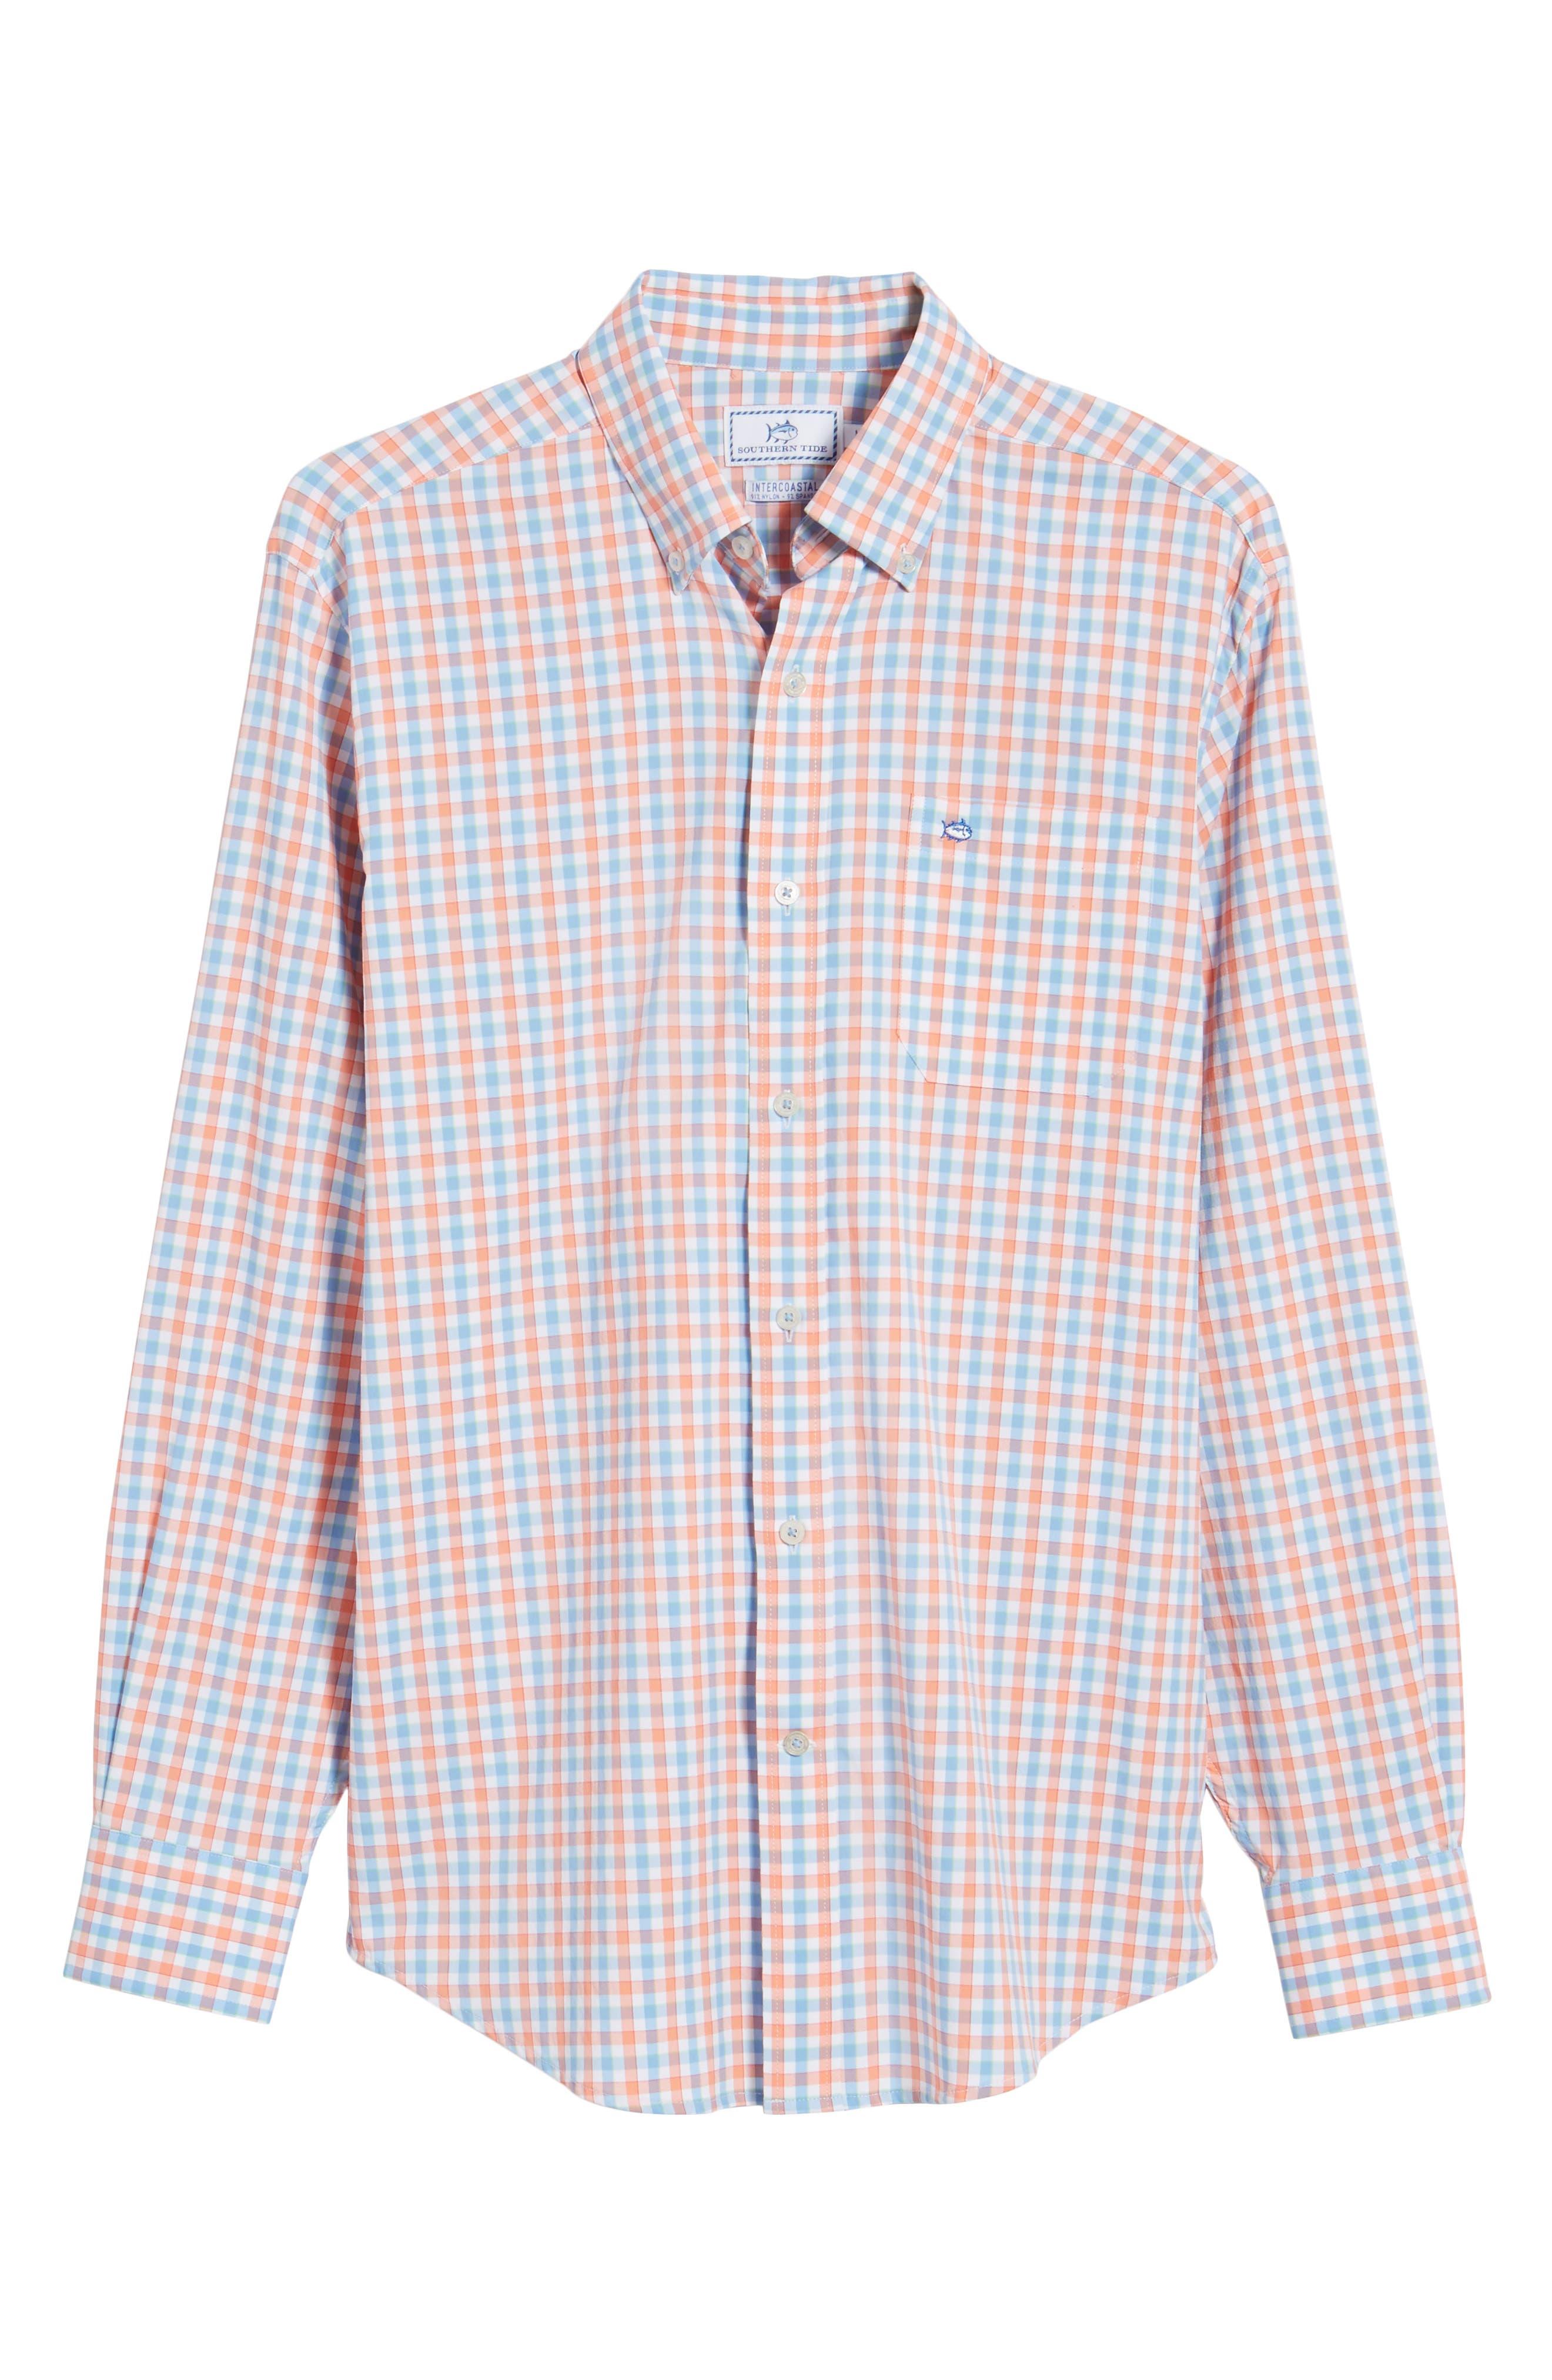 Market Square Regular Fit Stretch Check Sport Shirt,                             Alternate thumbnail 6, color,                             801